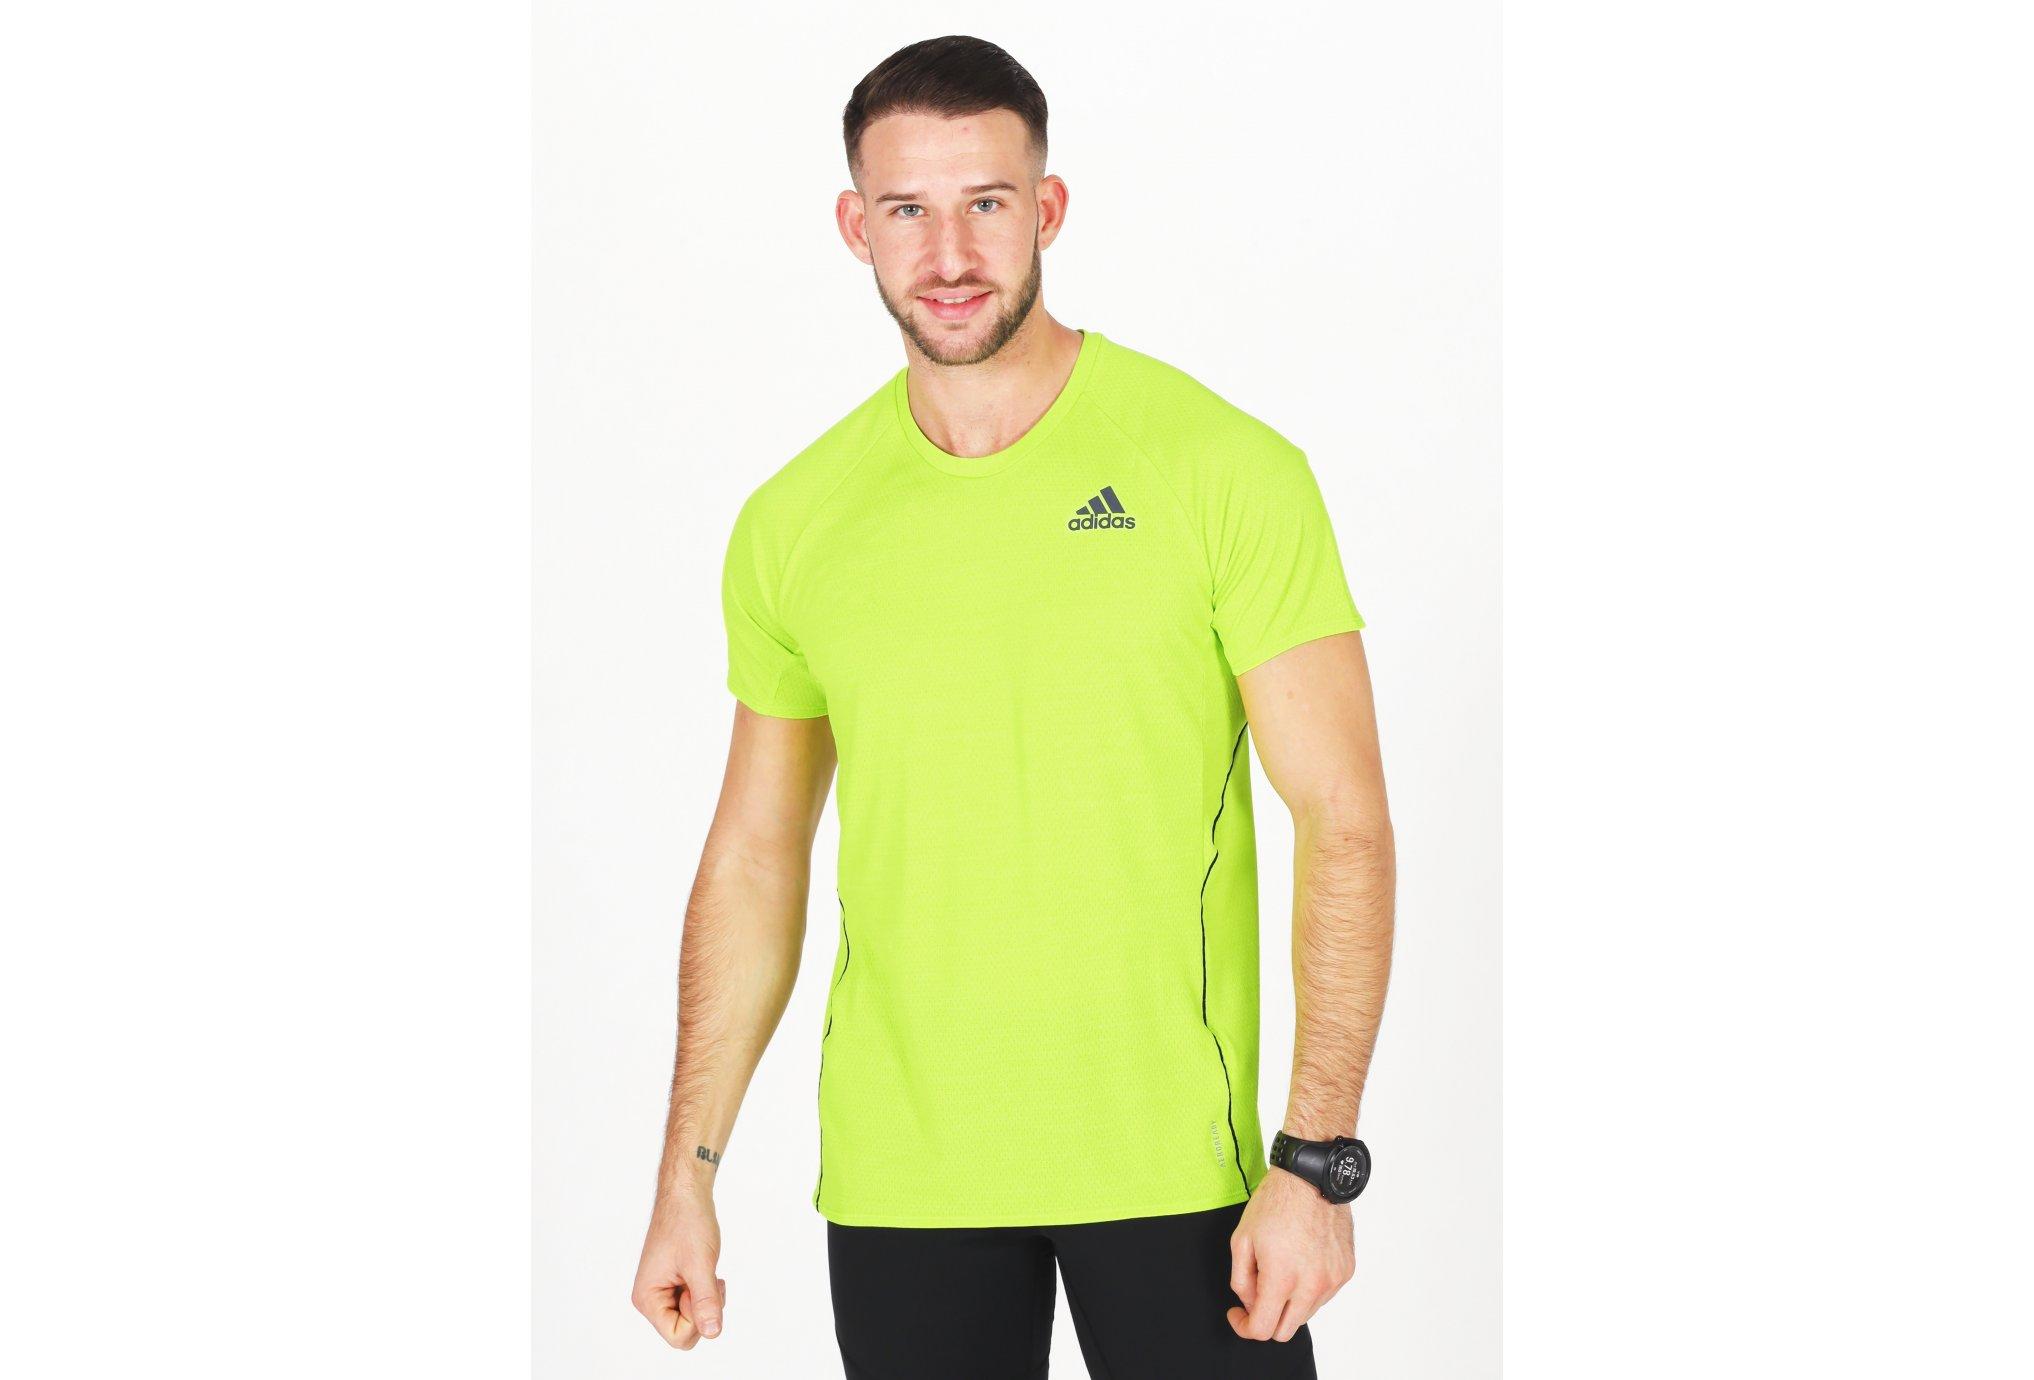 adidas Adi Runner M vêtement running homme